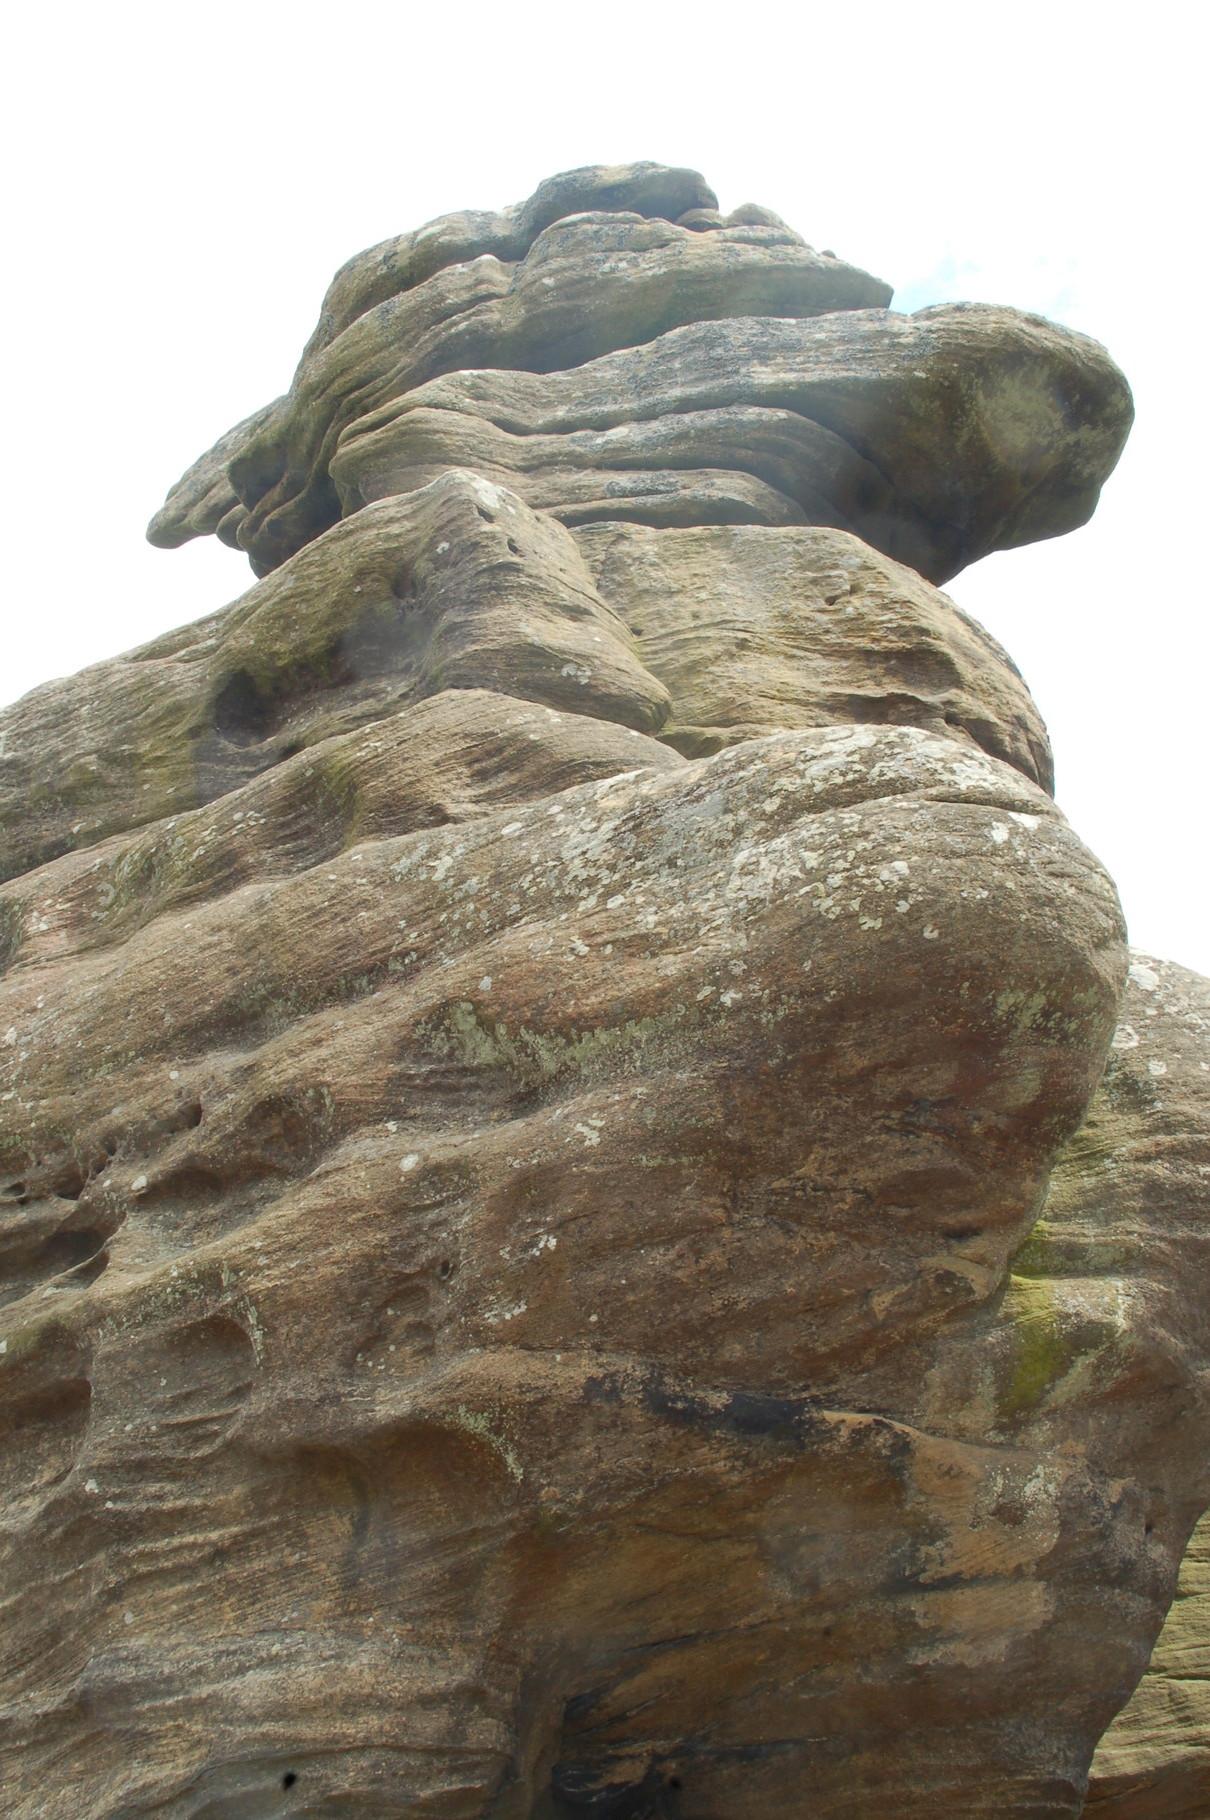 Yorkshire Dales, Brimham Rocks